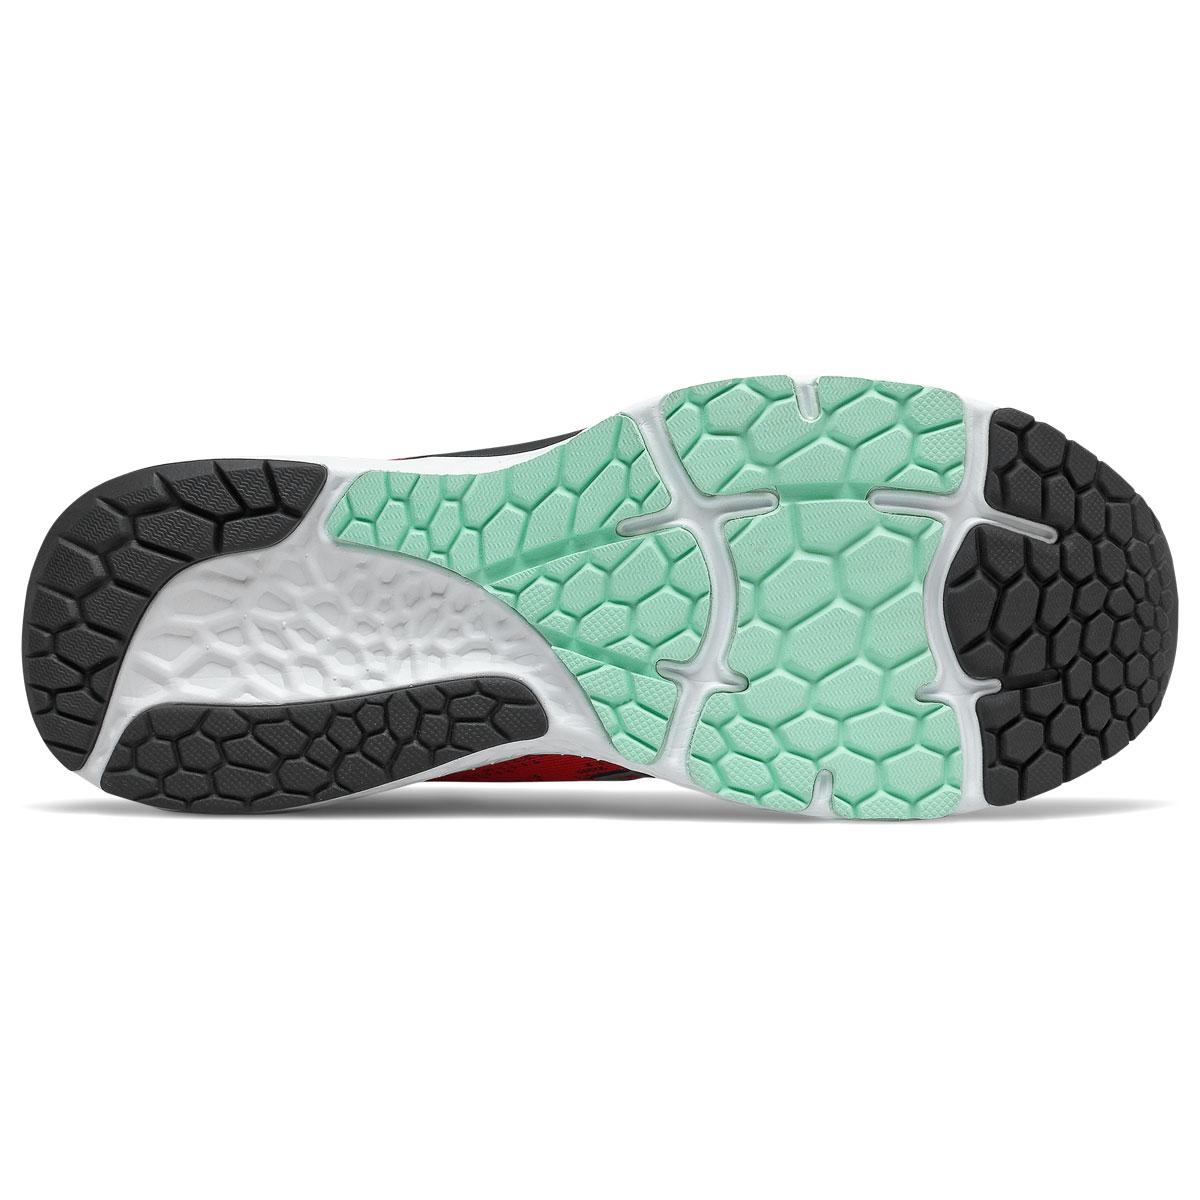 Men's New Balance Fresh Foam 880v11 Running Shoe - Color: Velocity Red/Black - Size: 8 - Width: Wide, Velocity Red/Black, large, image 4